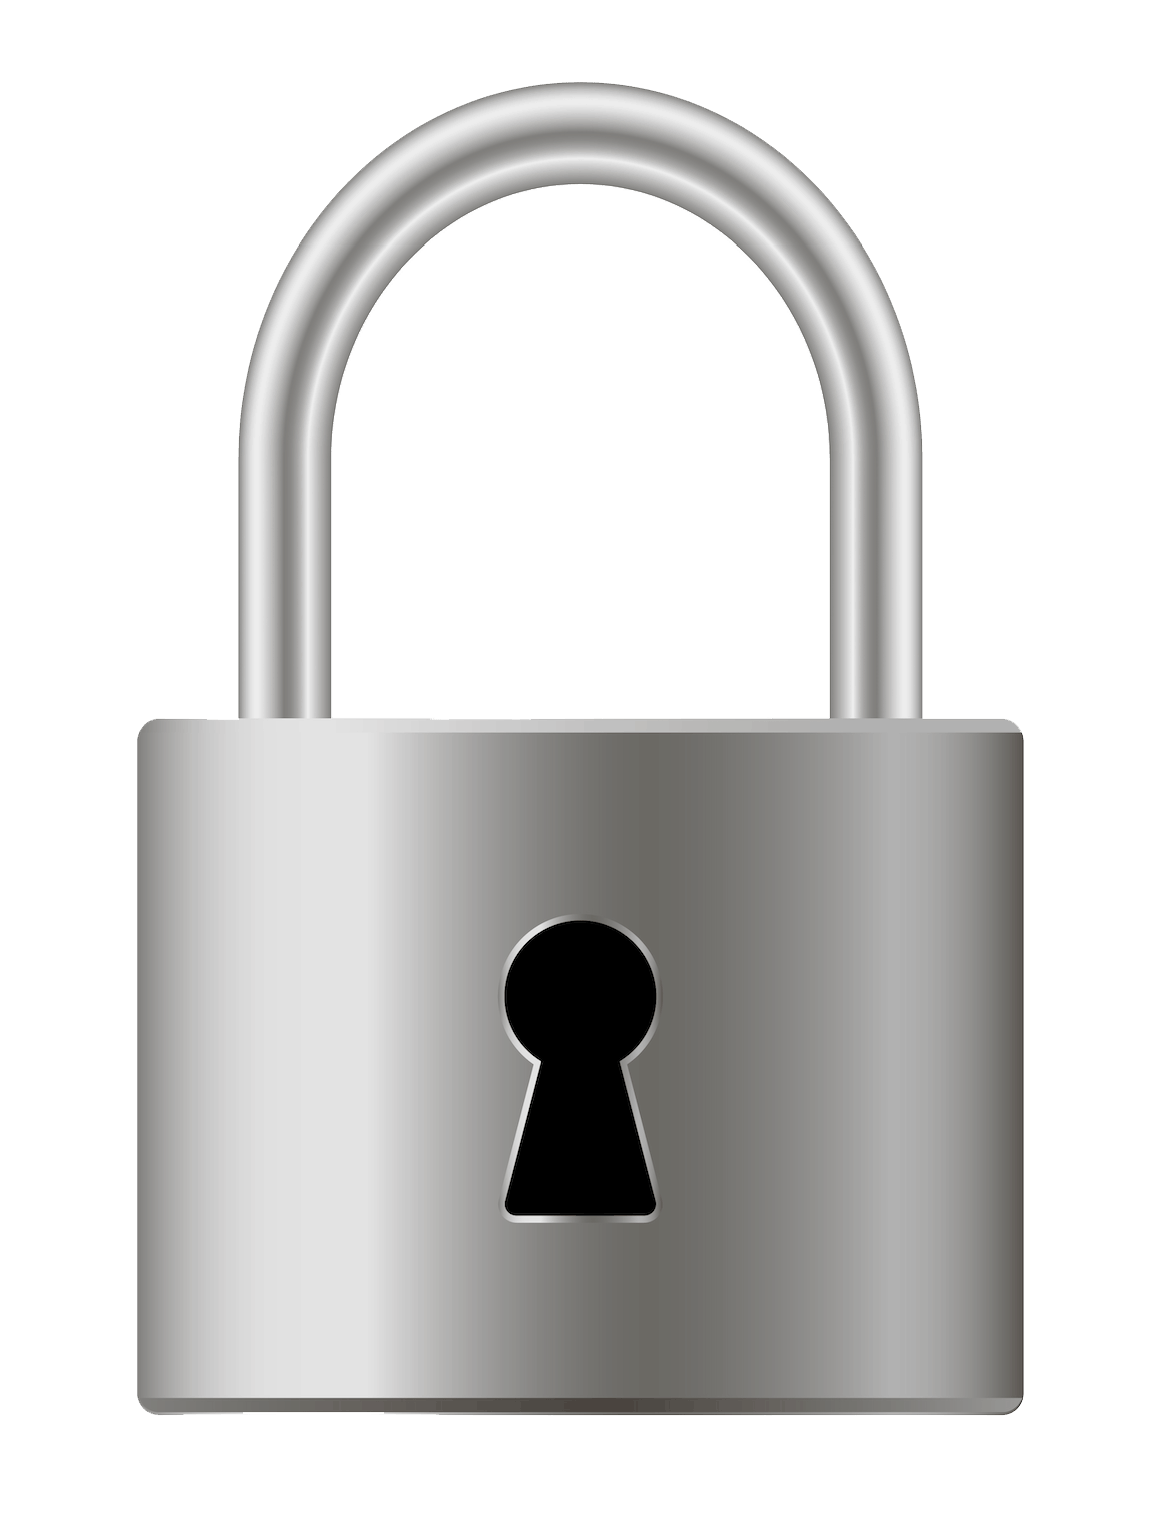 Kunci logam aman